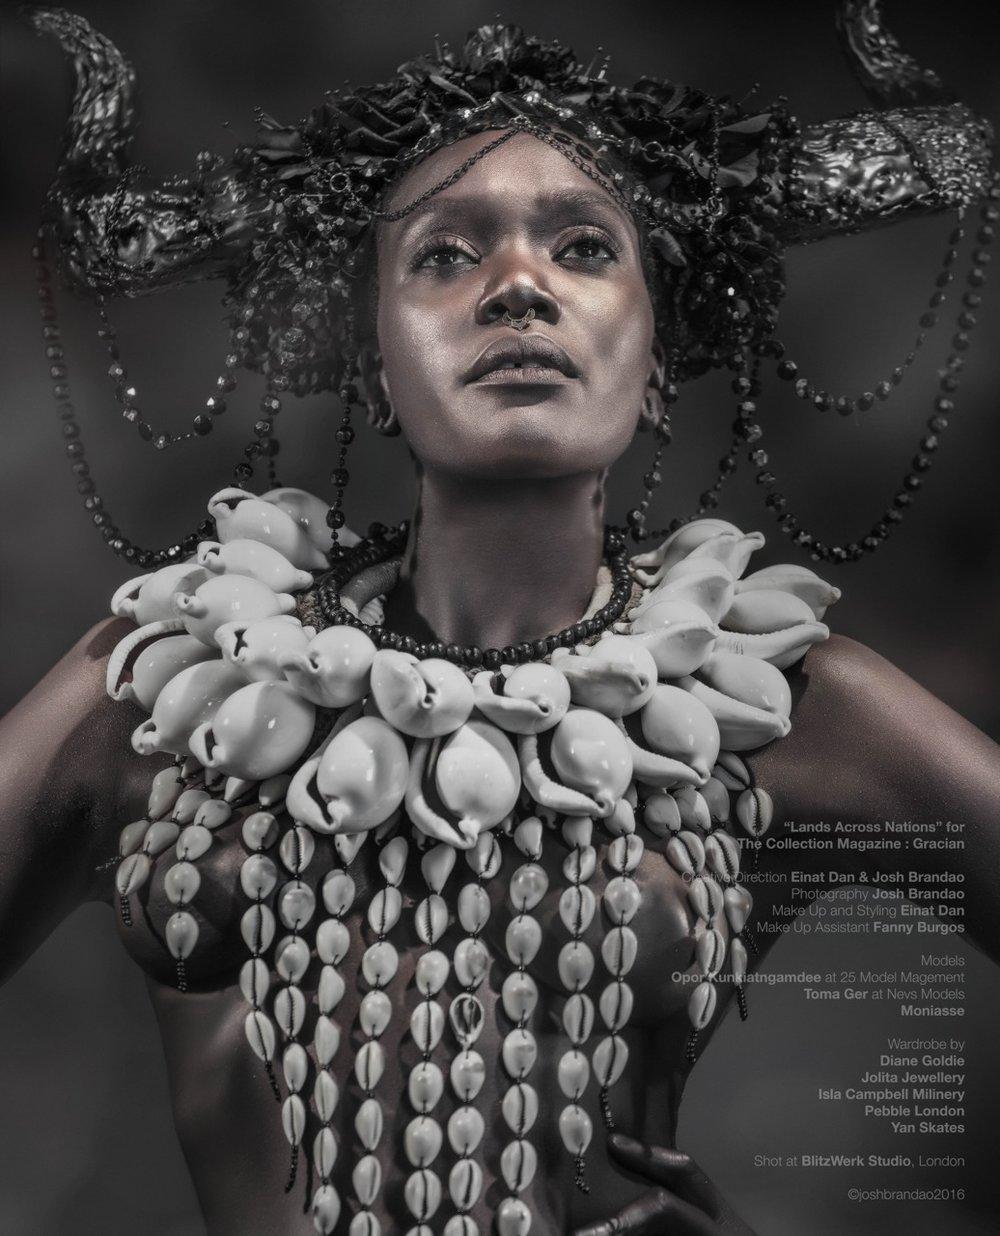 Gracian Magazine - Lands Across Nations - Diane Goldie Einat Dan Isla Campbell Millinery Josh Brandao Moniasse Pebble London Jolita Jewellery